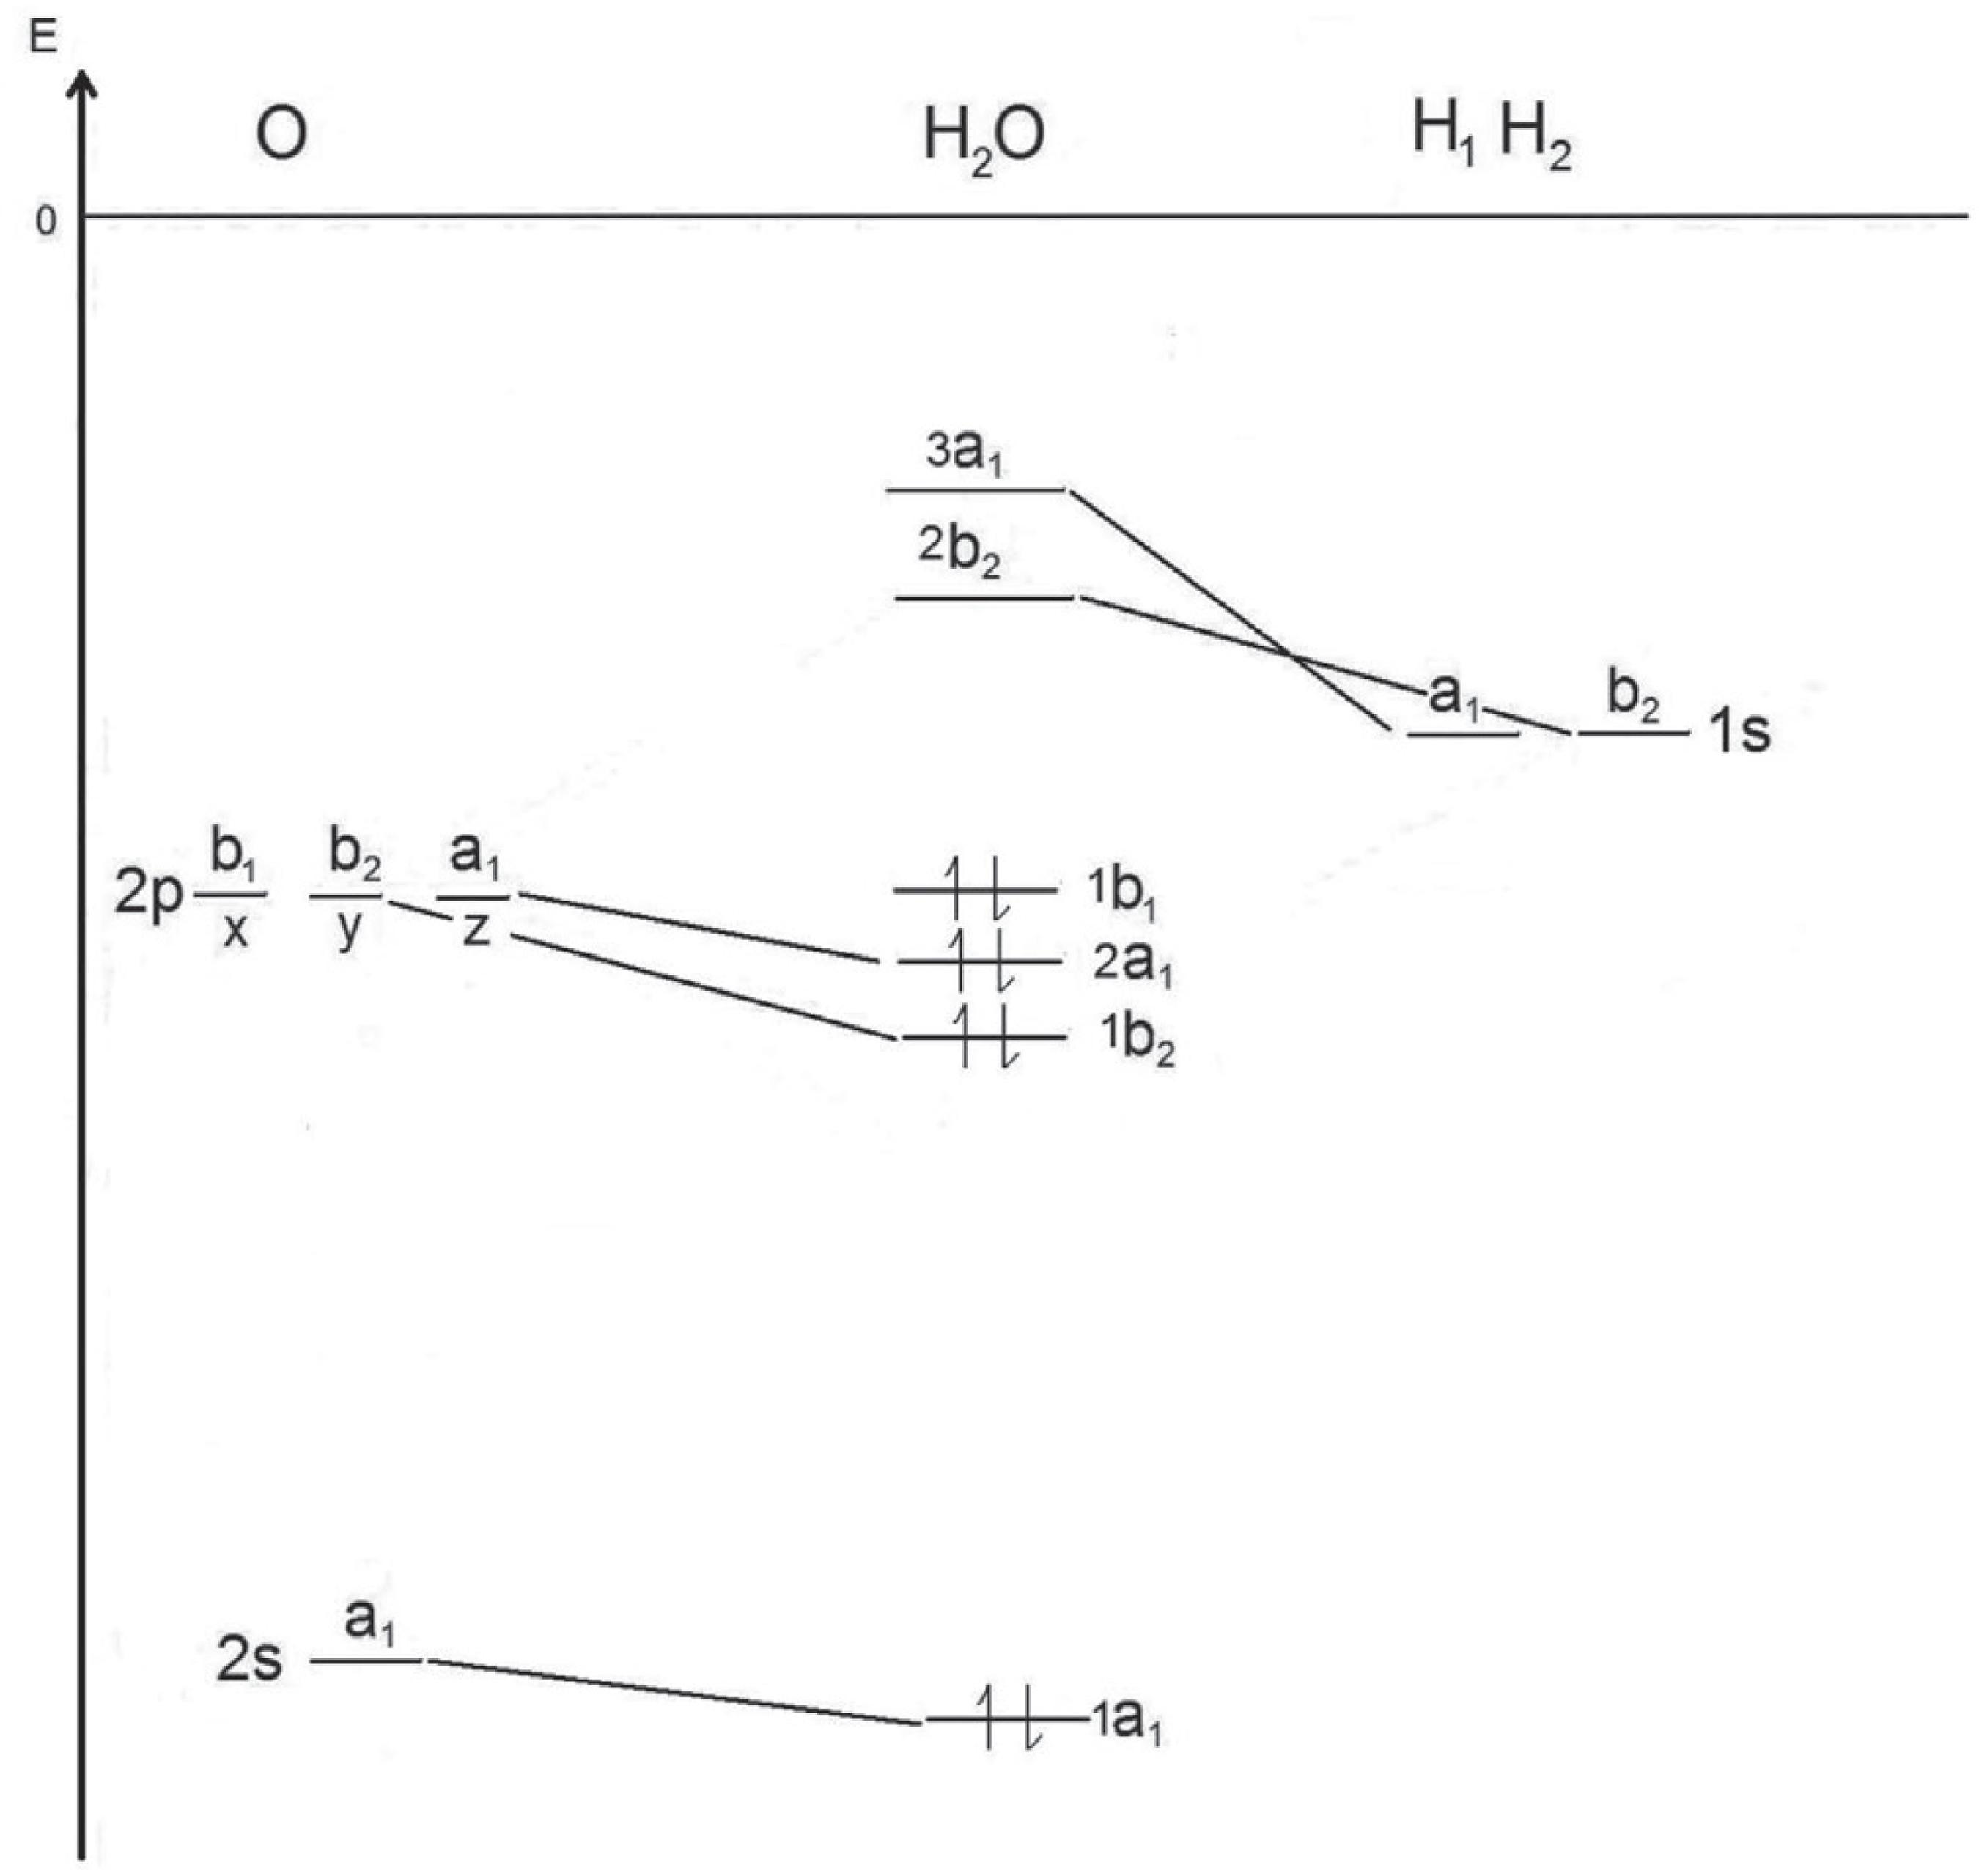 Molecular Orbital Diagram Explaining The Geometry Of Simple Molecules Using Molecular Orbital